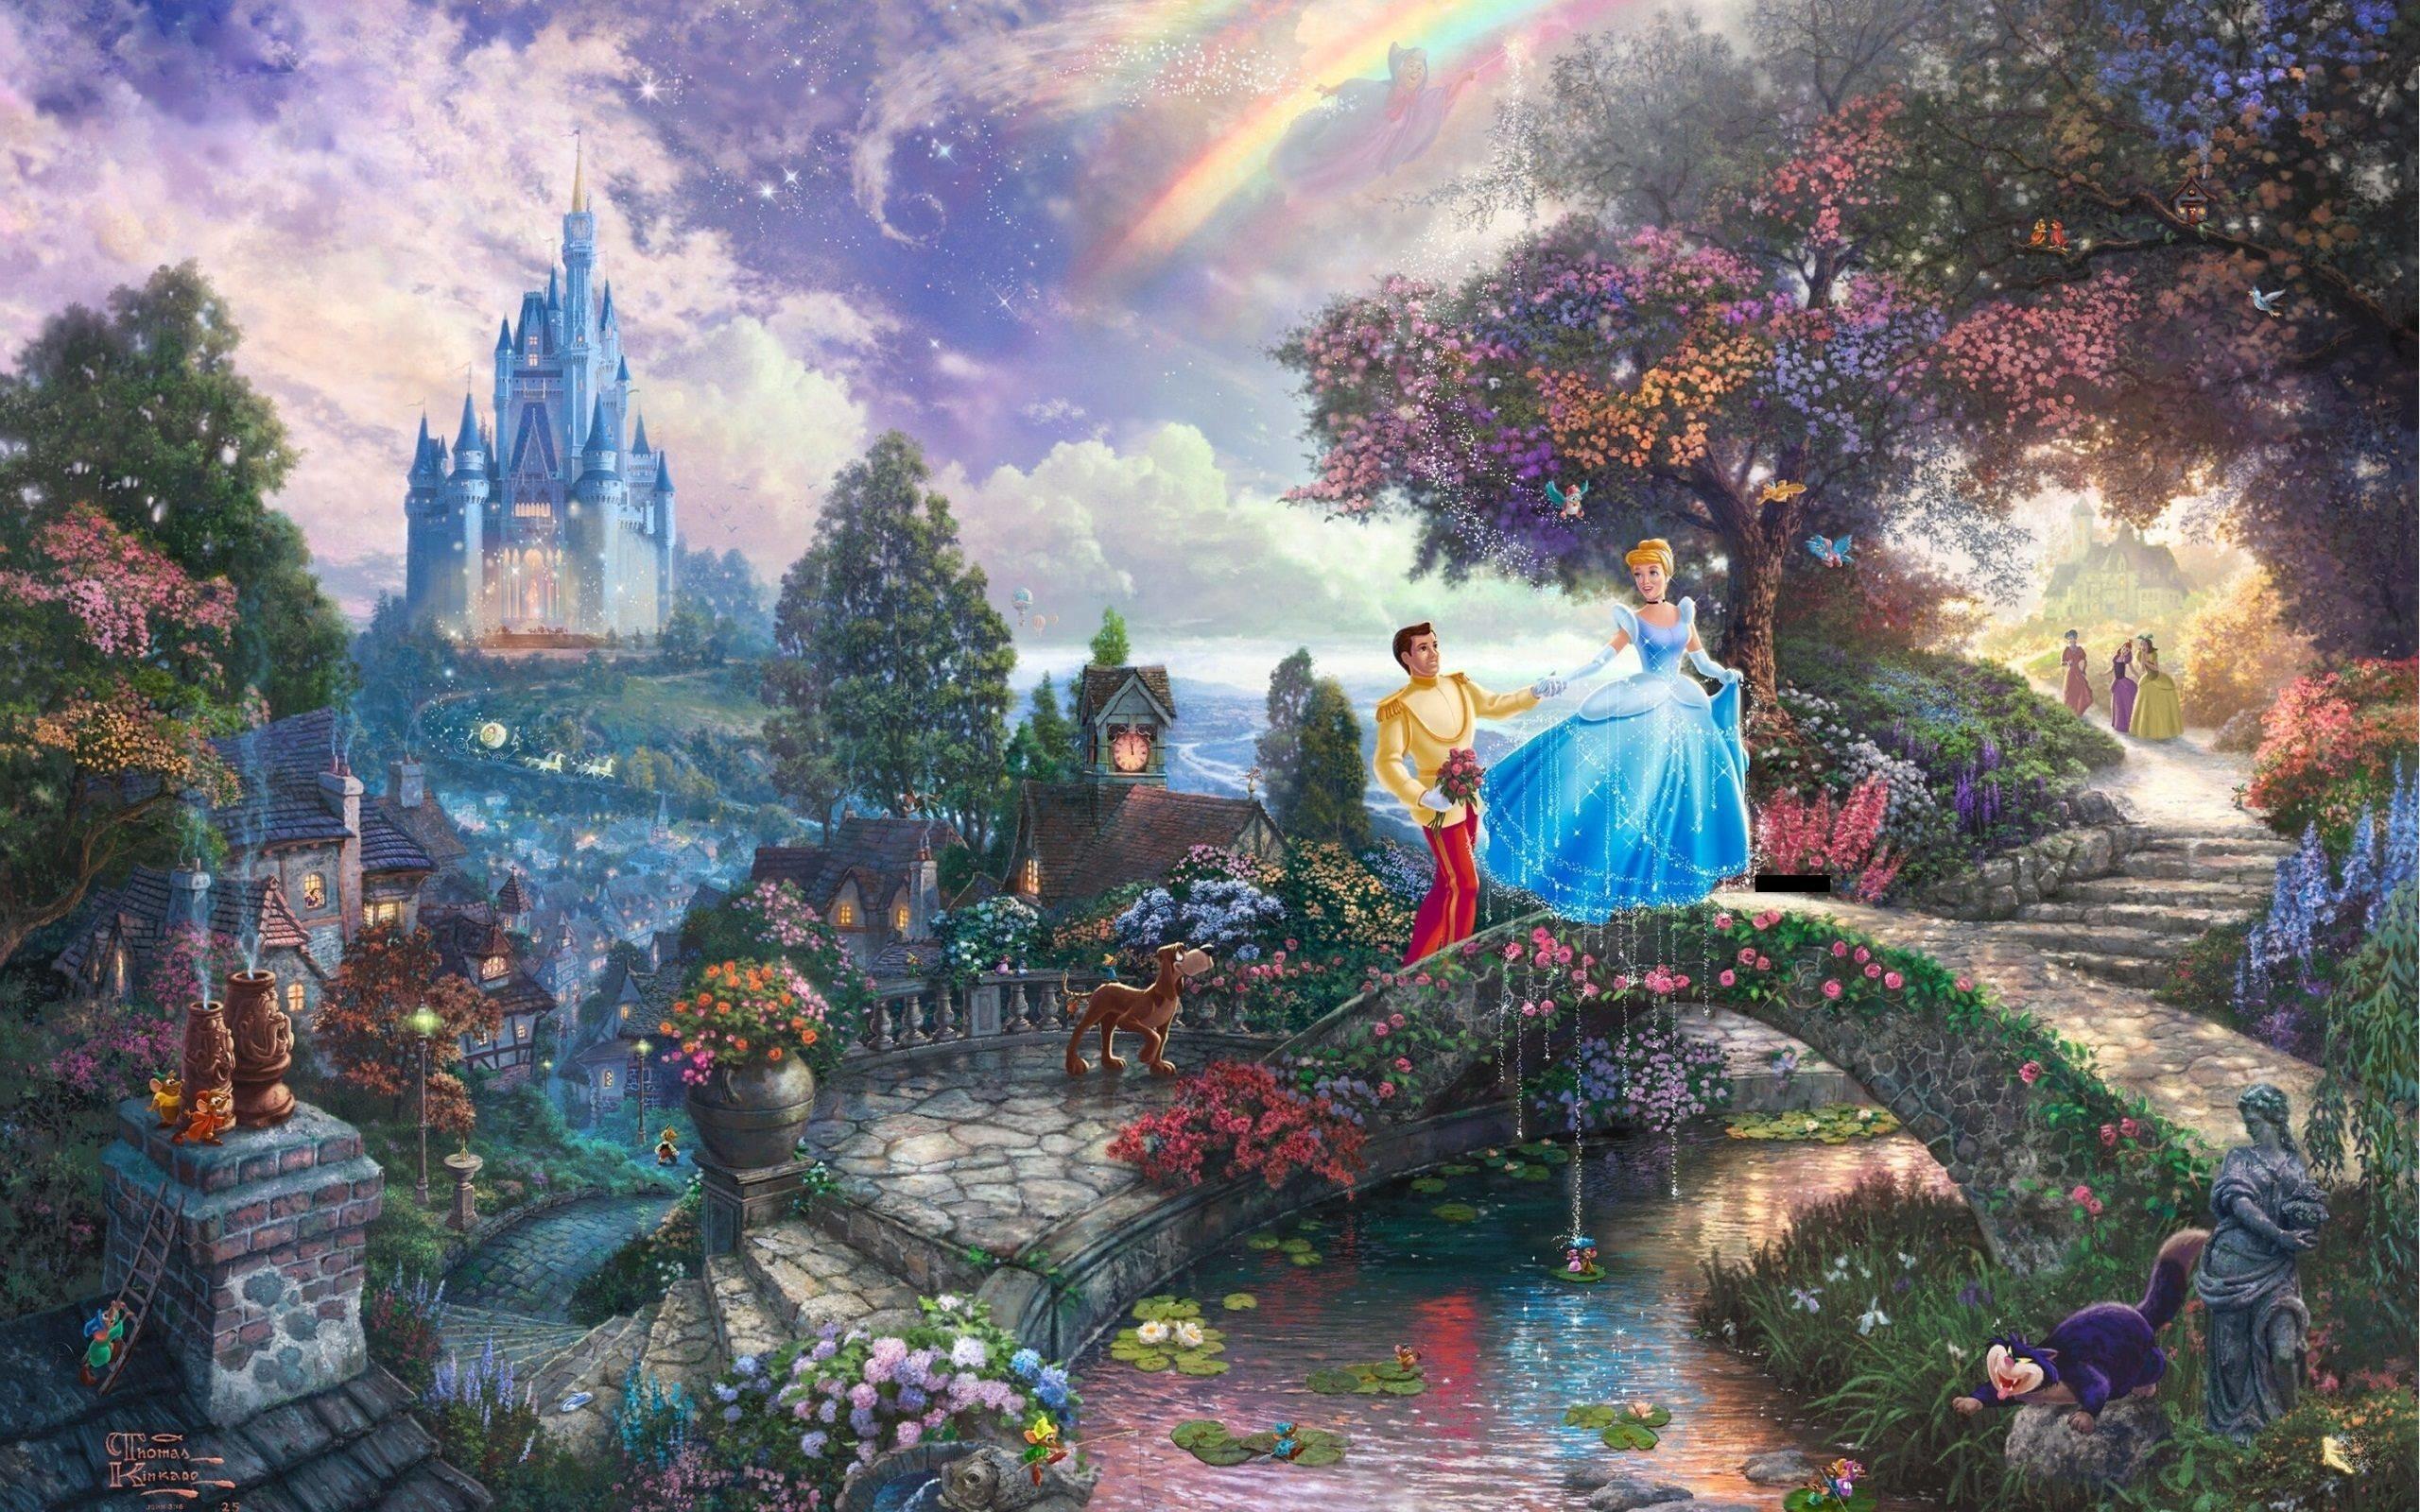 Cinderella Wallpapers – Full HD wallpaper search